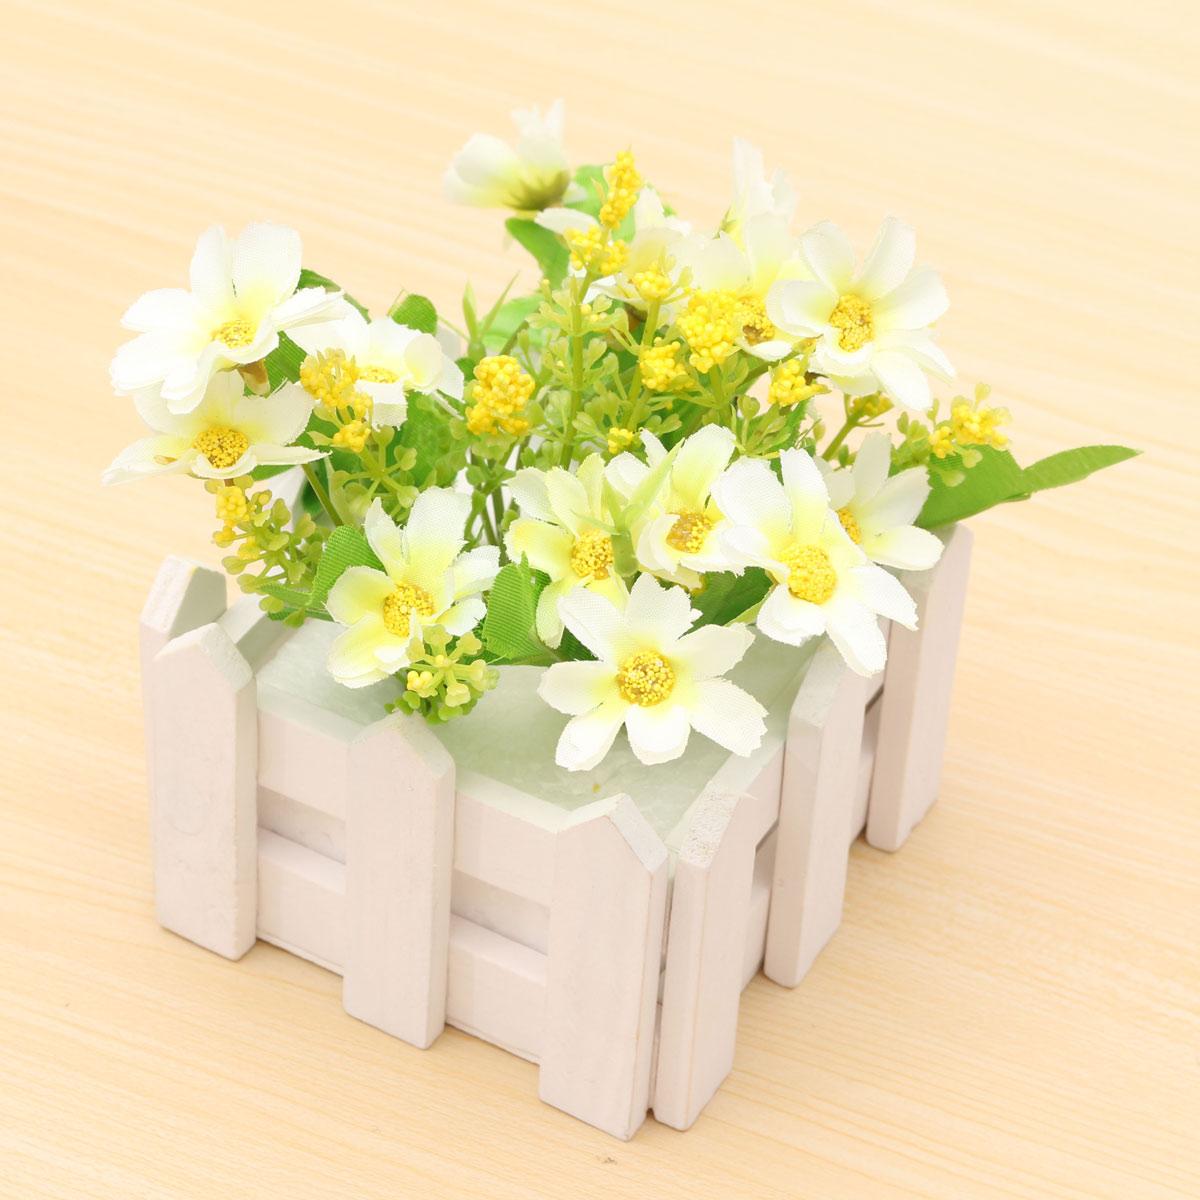 Artificial flowers indoor outdoor potted plants wooden fence floral garden ebay - Indoor potted flowers ...